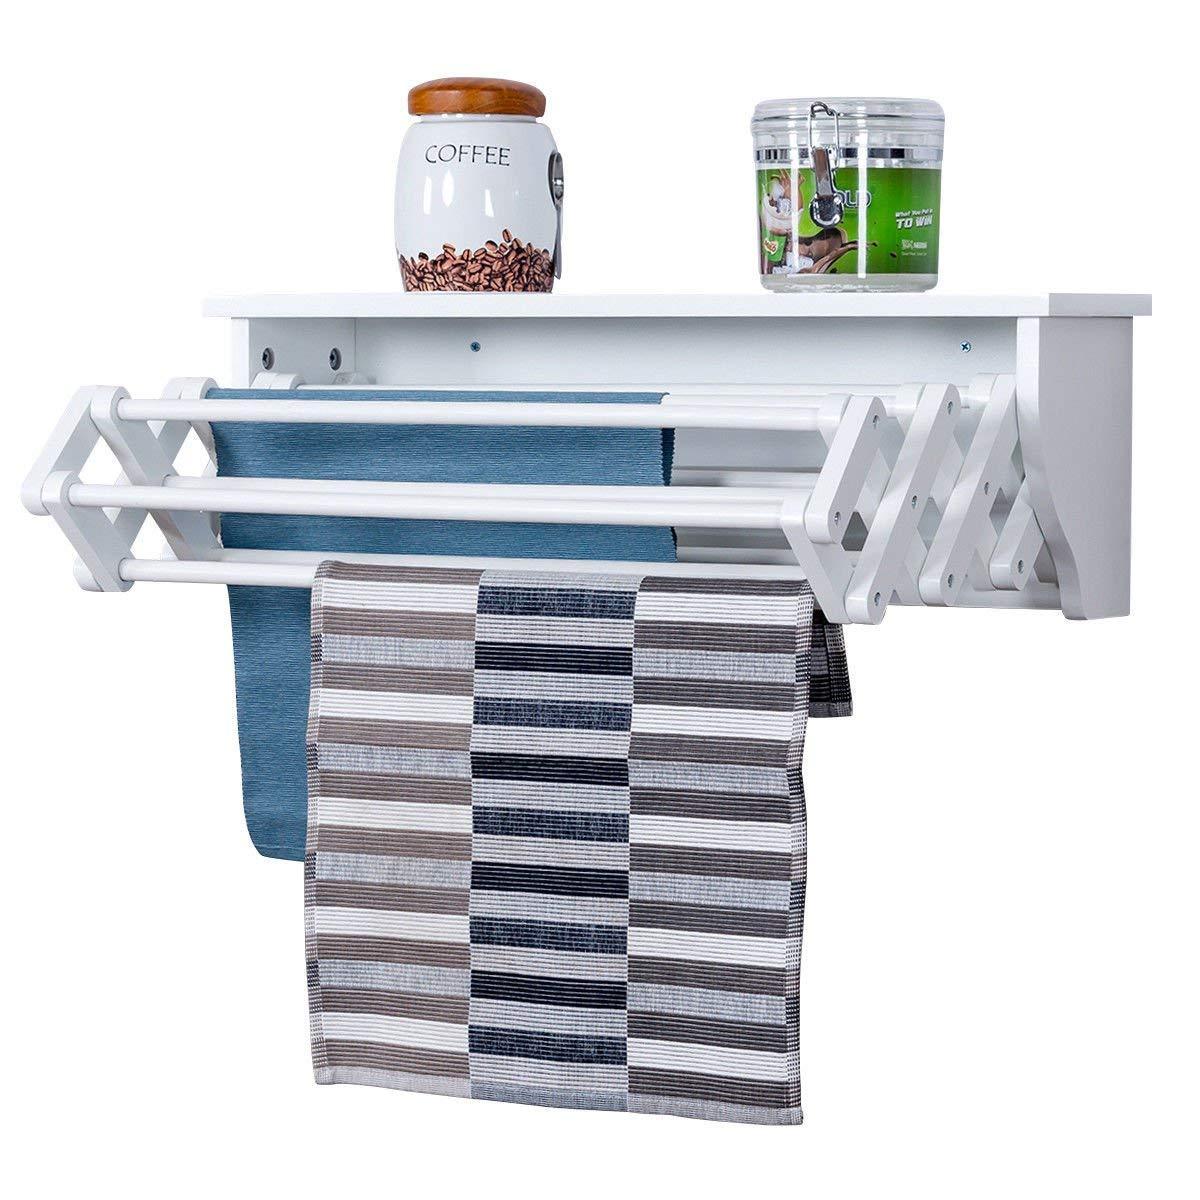 TANGKULA Wall Mount Drying Rack Bathroom Home Expandable Towel Rack Drying Laudry Hanger Clothes Rack (Wood) by TANGKULA (Image #3)